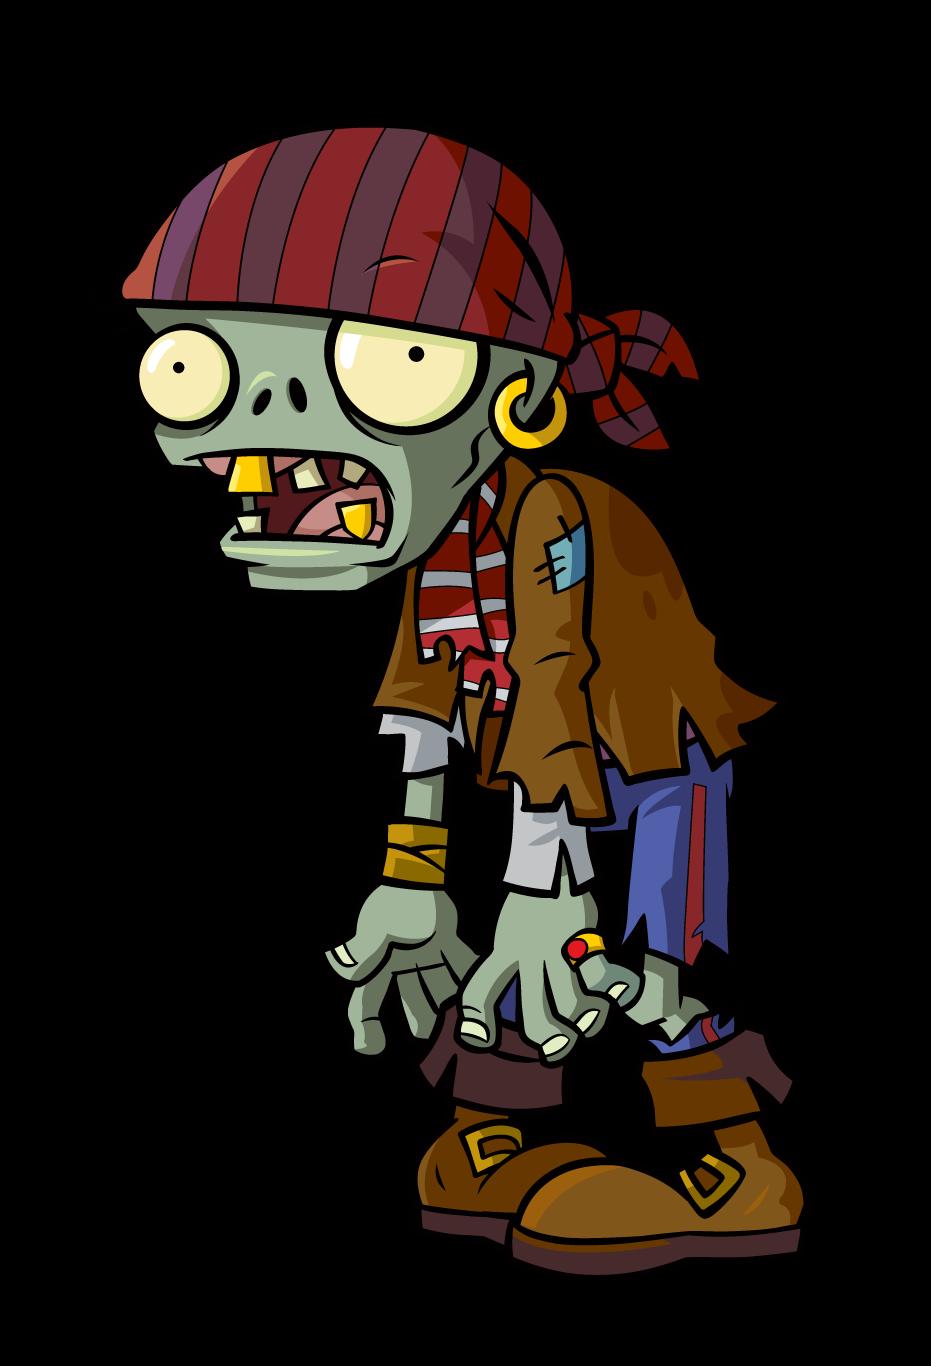 Zombie clipart cartoon baby. Pirate plants v zombies